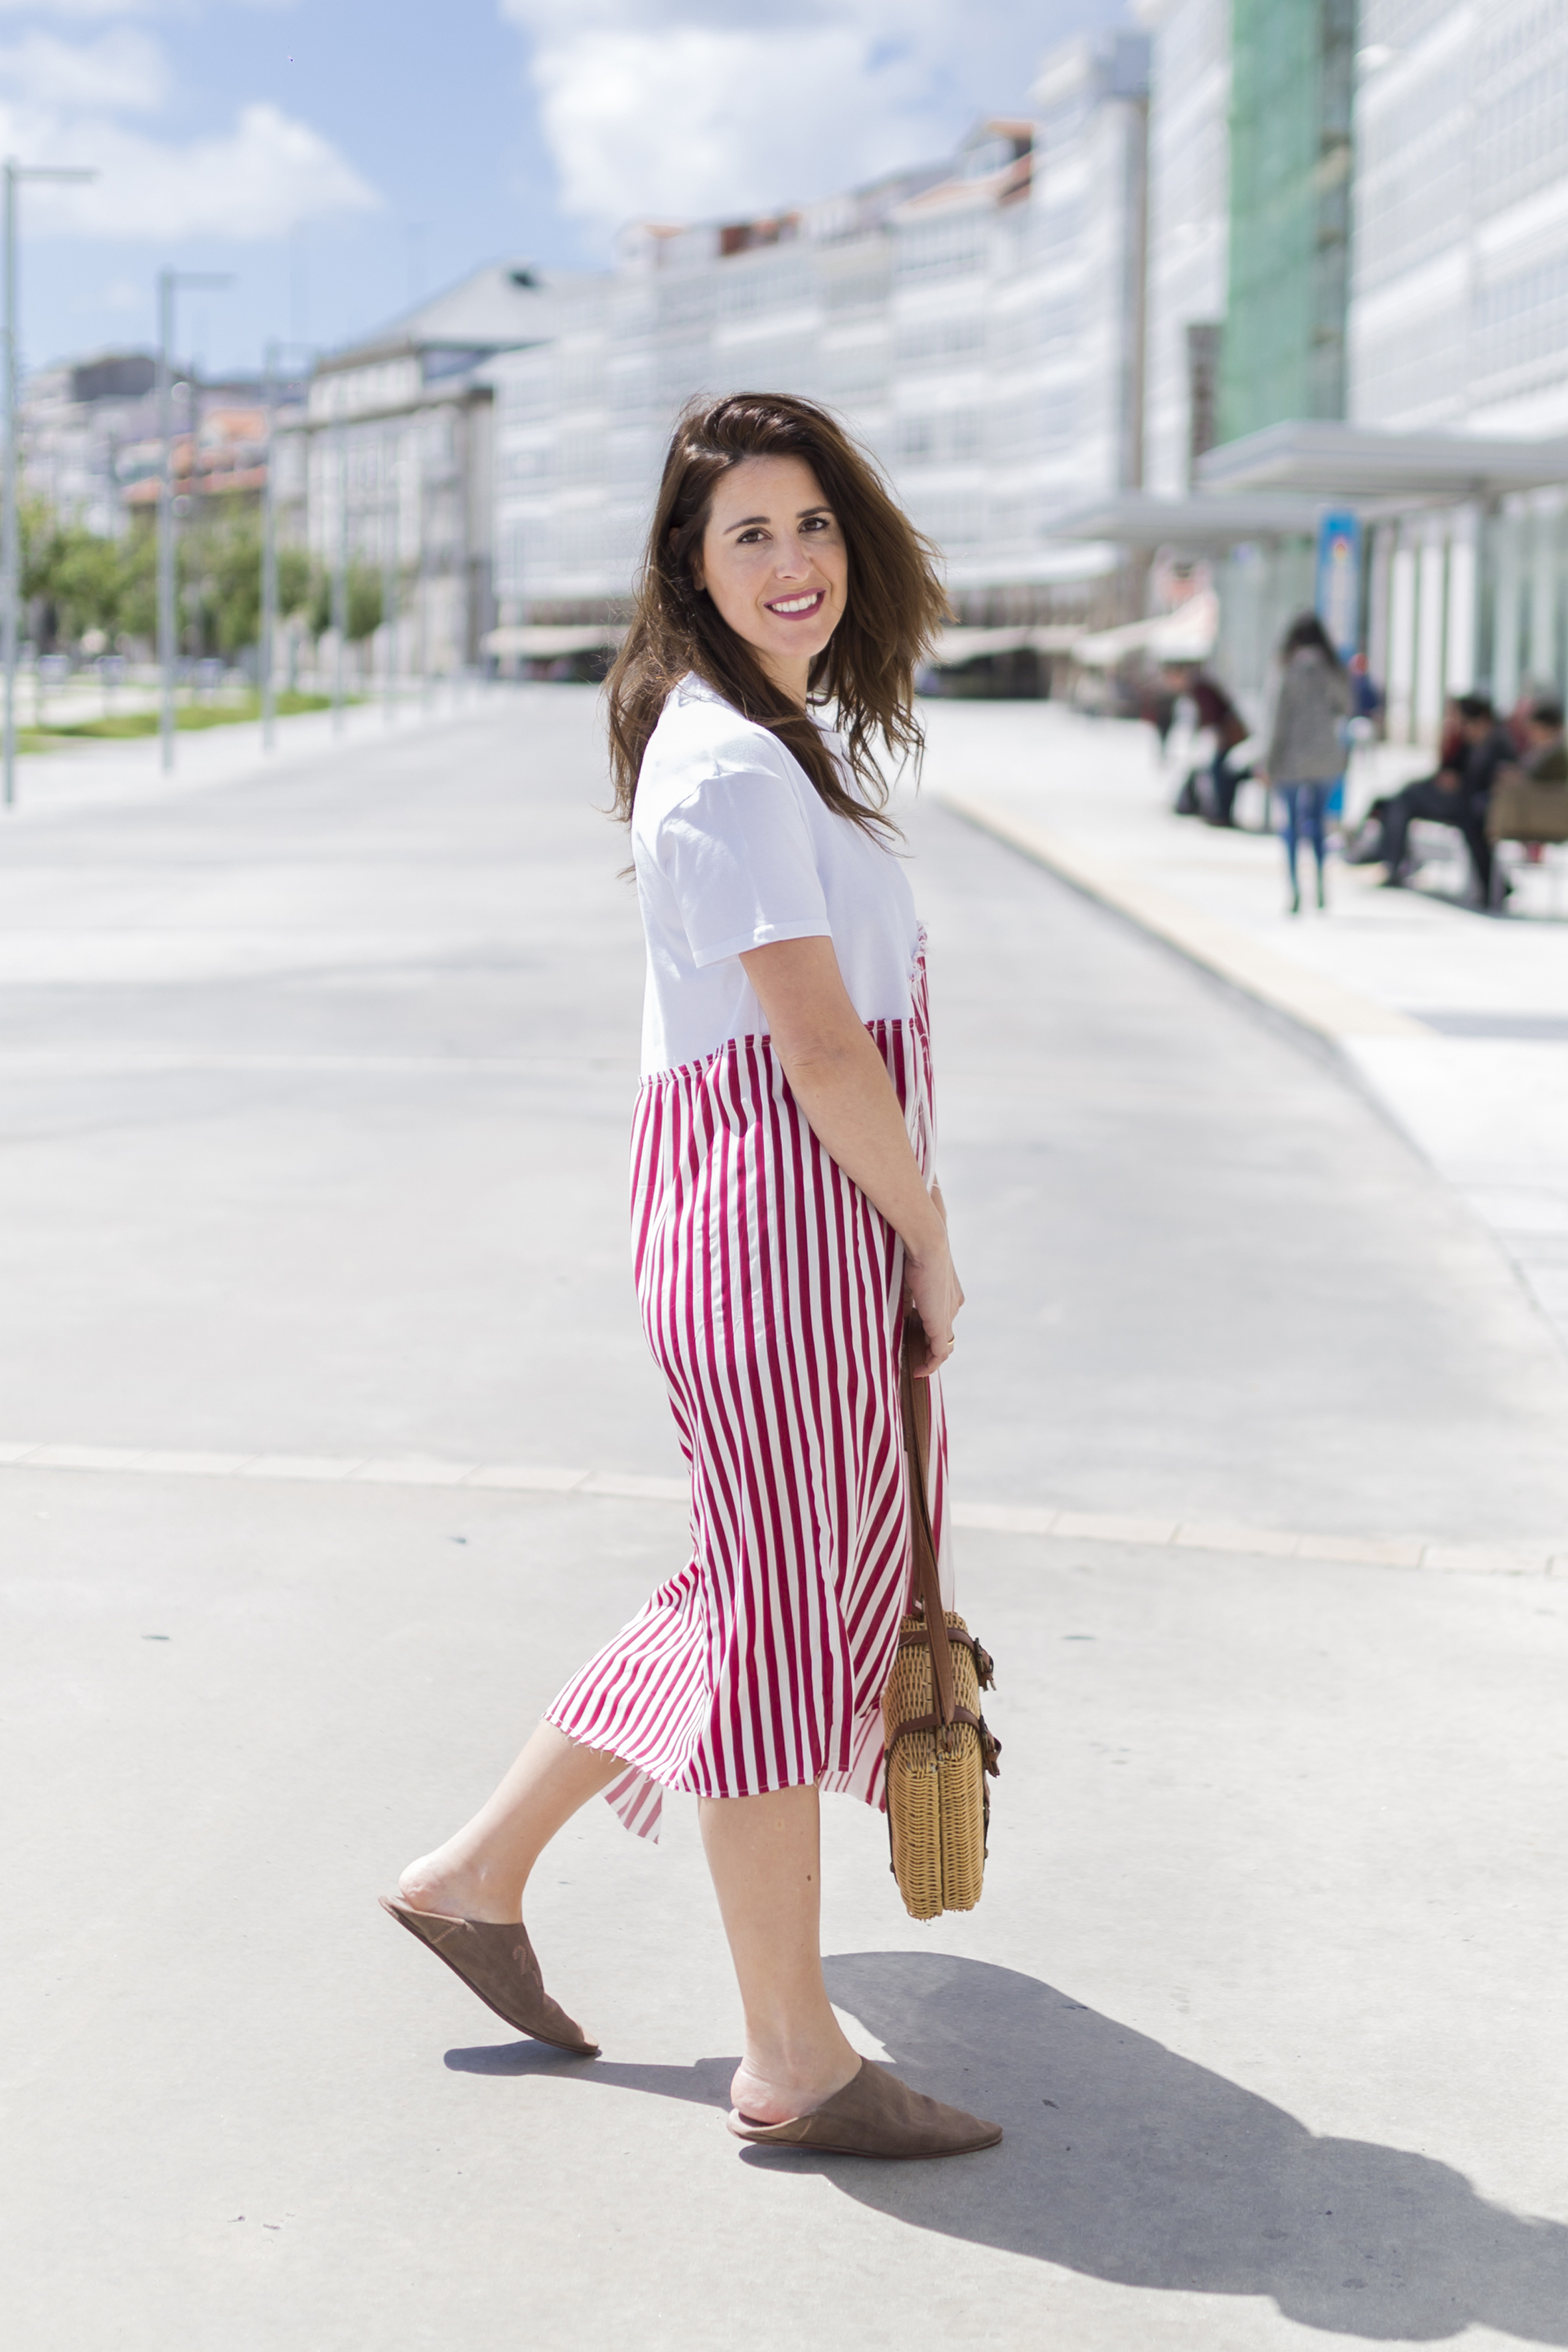 blanco bag - alba cuesta · babuchas · blogger · blanco · descalza look · estilista · fashion · marruecos · outfit · rayas · street style · zara